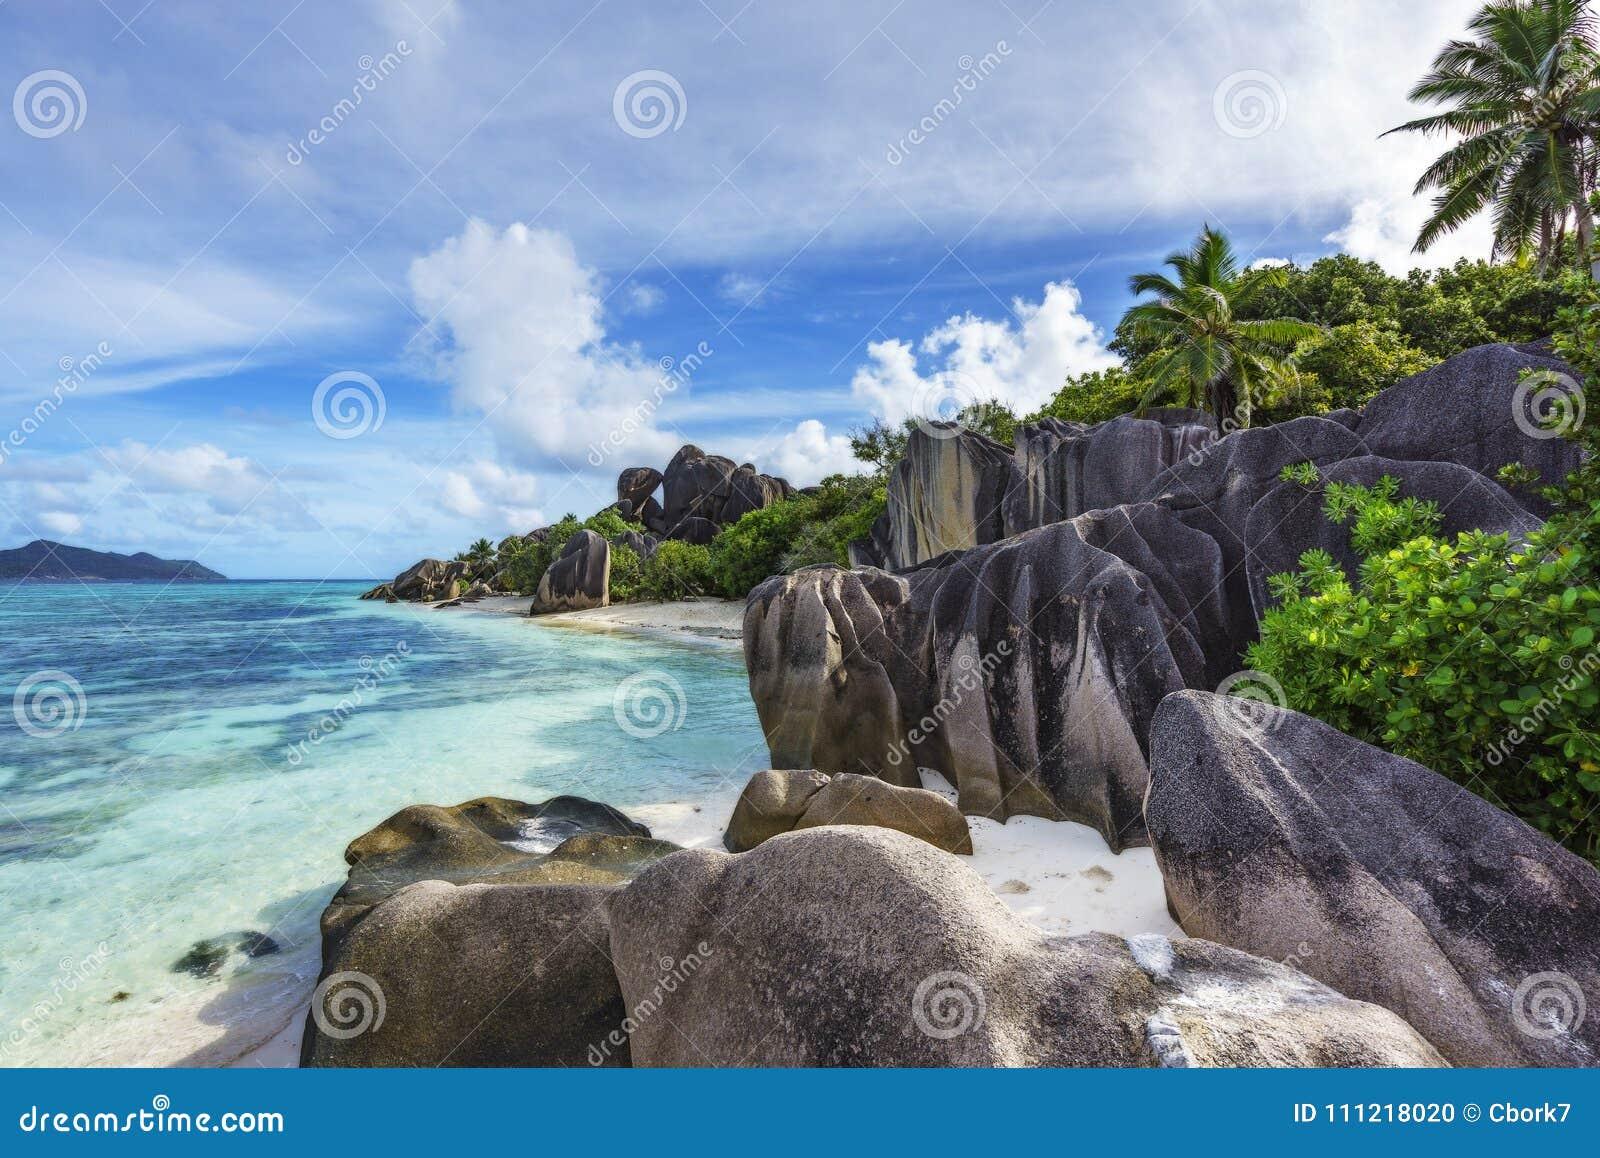 Rocks,white sand,palms,turquoise water at tropical beach,la diqu